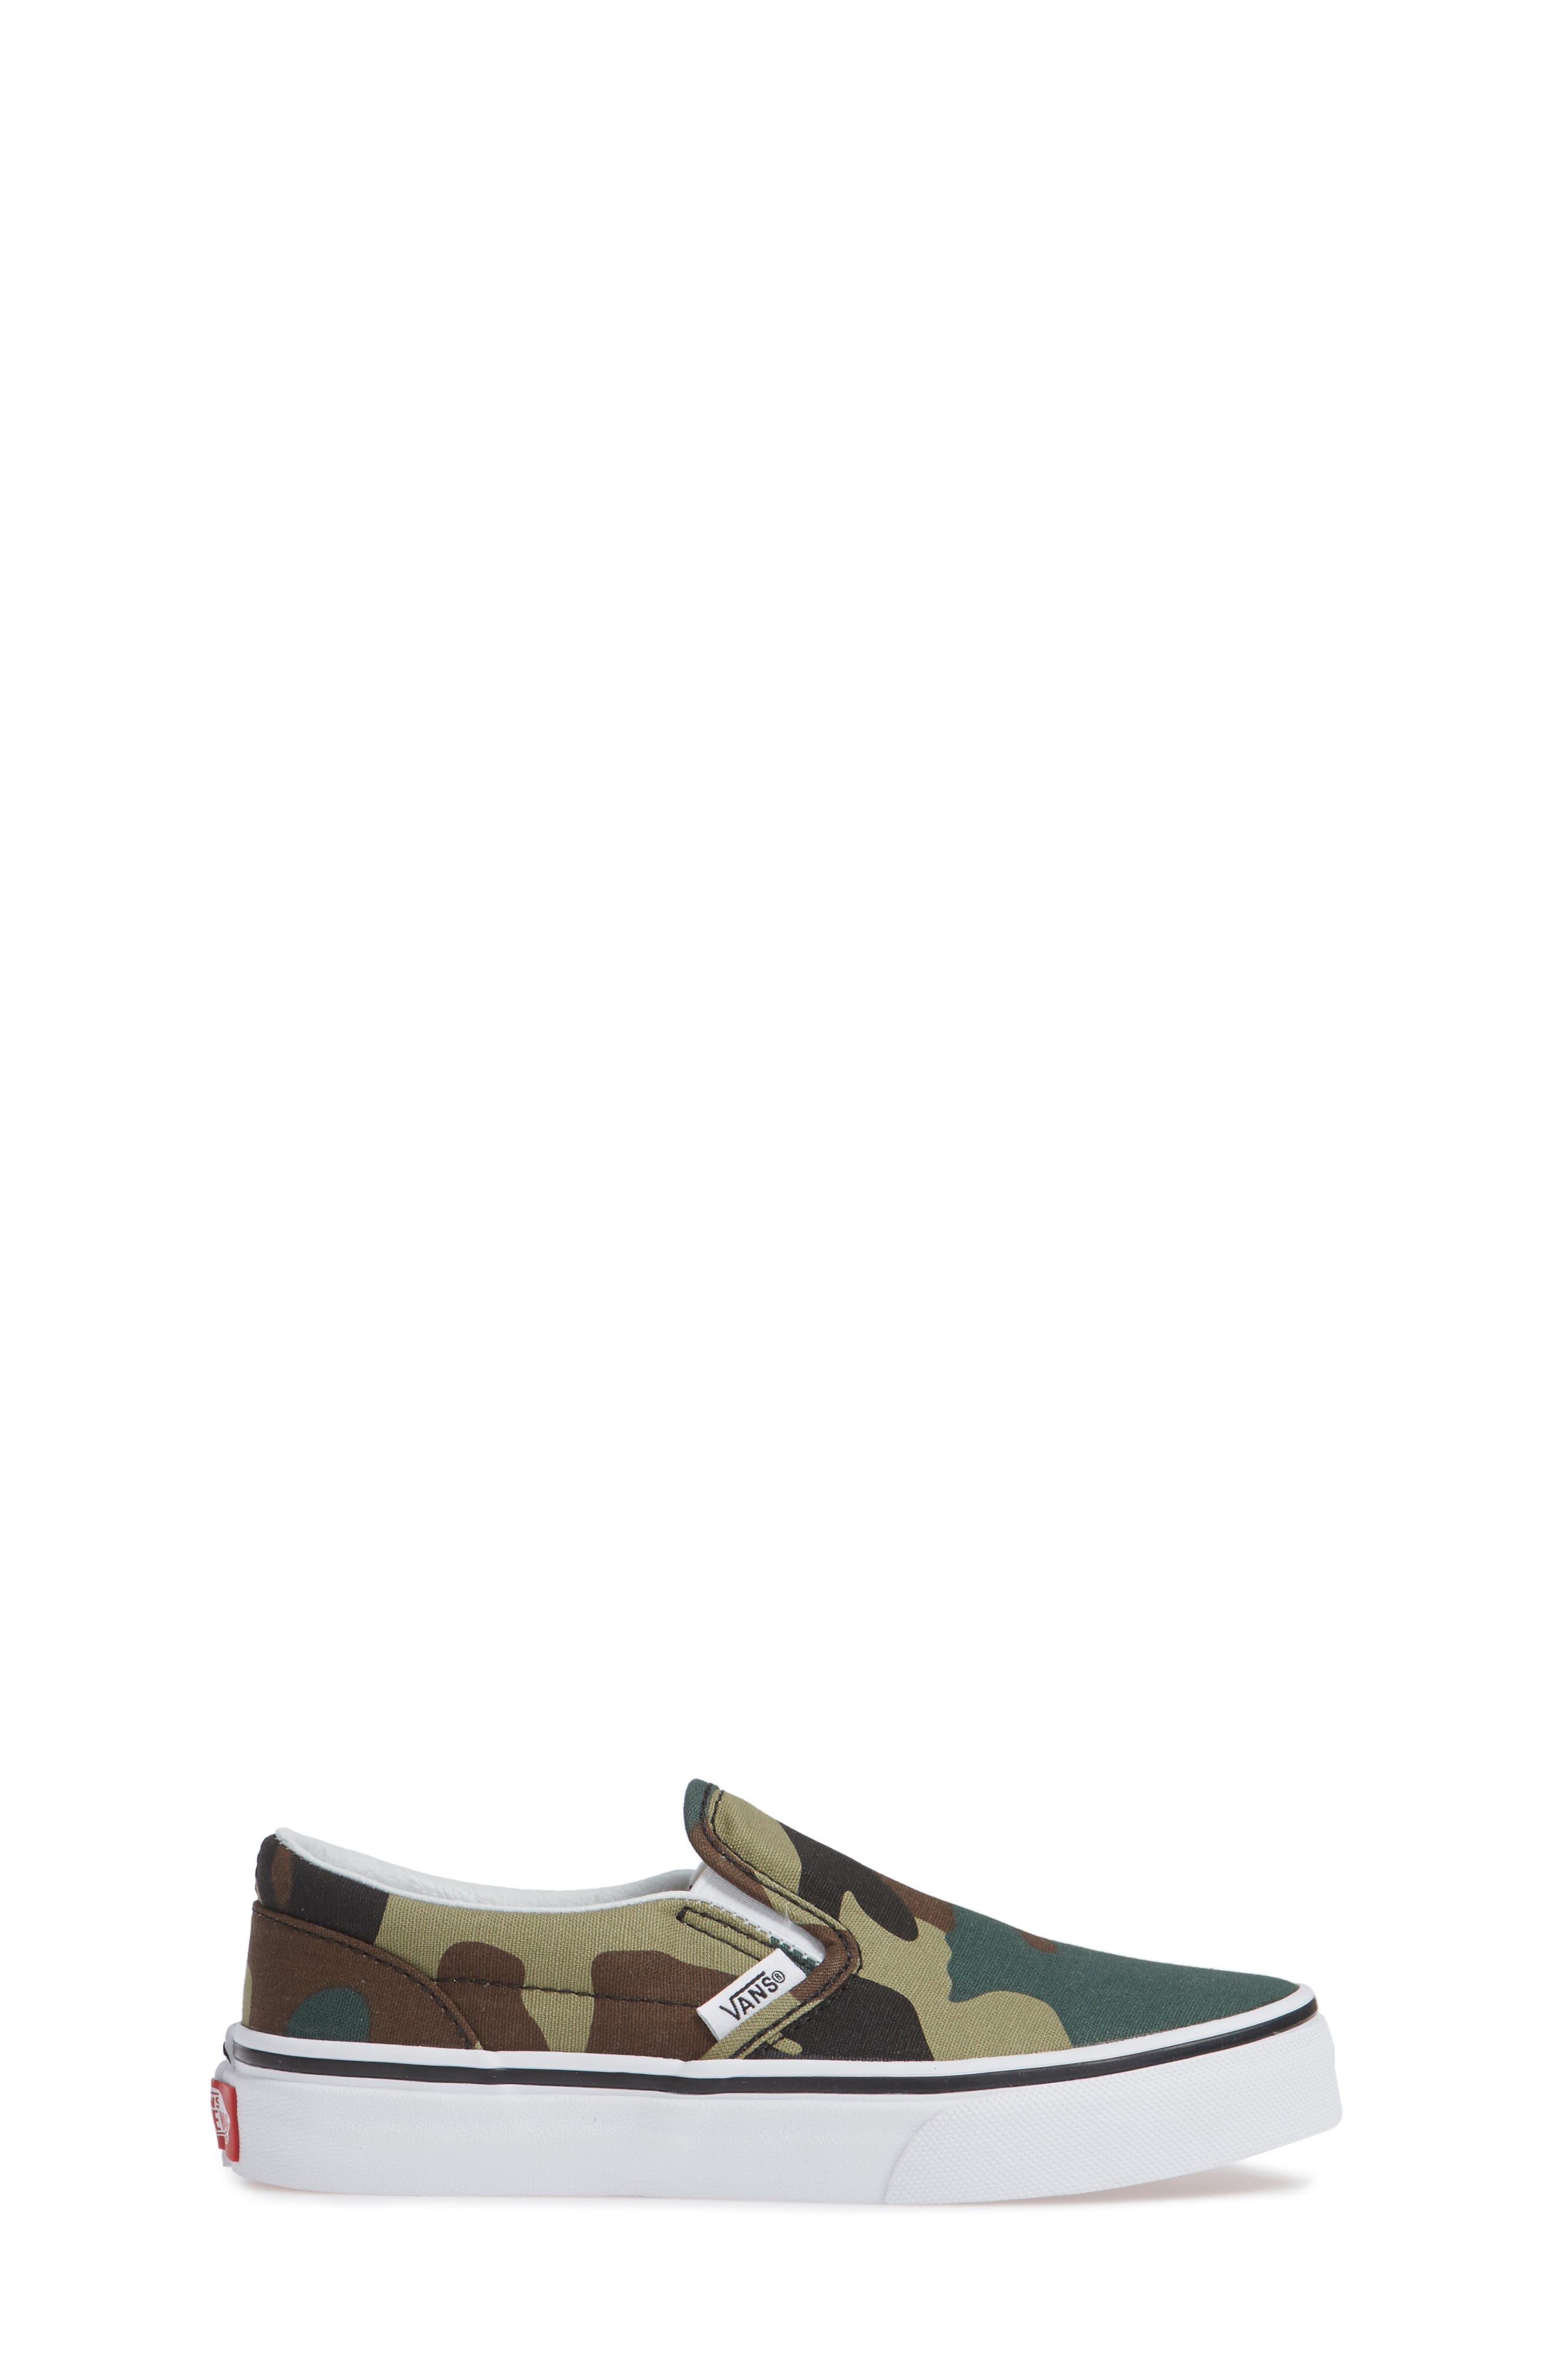 Classic Slip-On Sneaker,                             Alternate thumbnail 3, color,                             WOODLAND CAMO BLACK/ WOODLAND